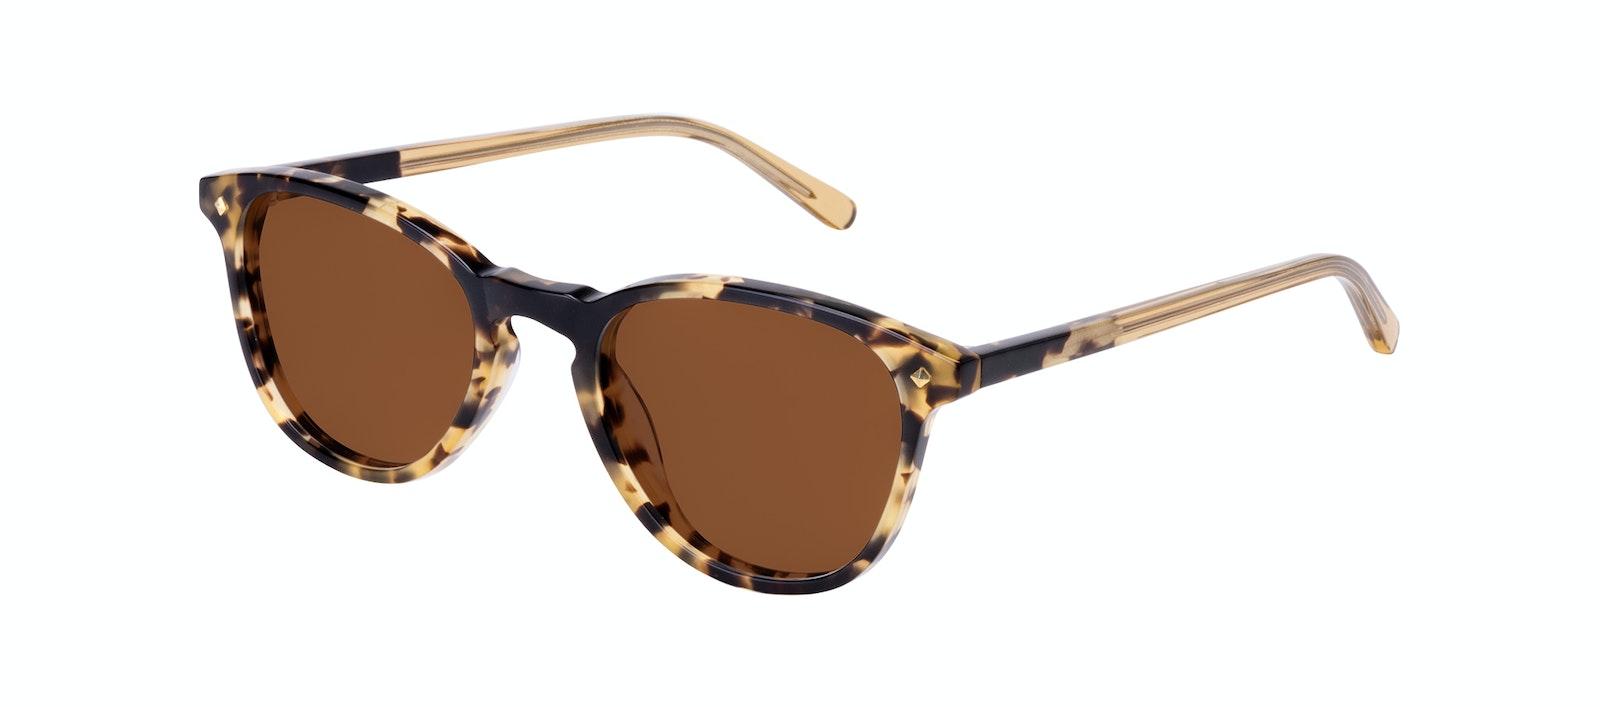 Affordable Fashion Glasses Round Sunglasses Women Crush Bingal Tilt